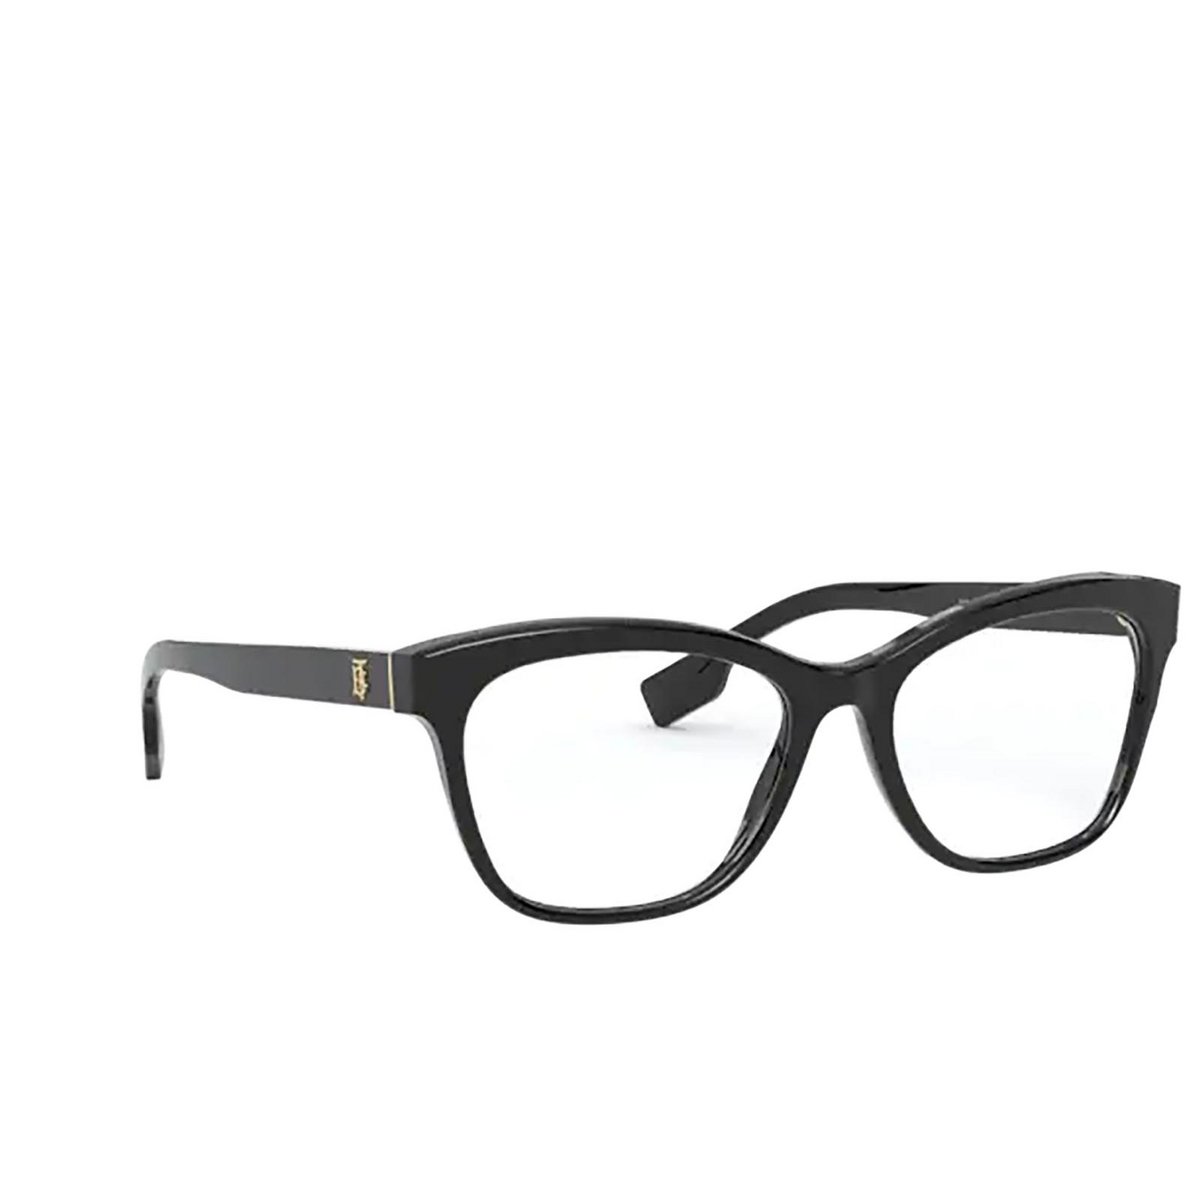 Burberry® Square Eyeglasses: Mildred BE2323 color Black 3001 - three-quarters view.